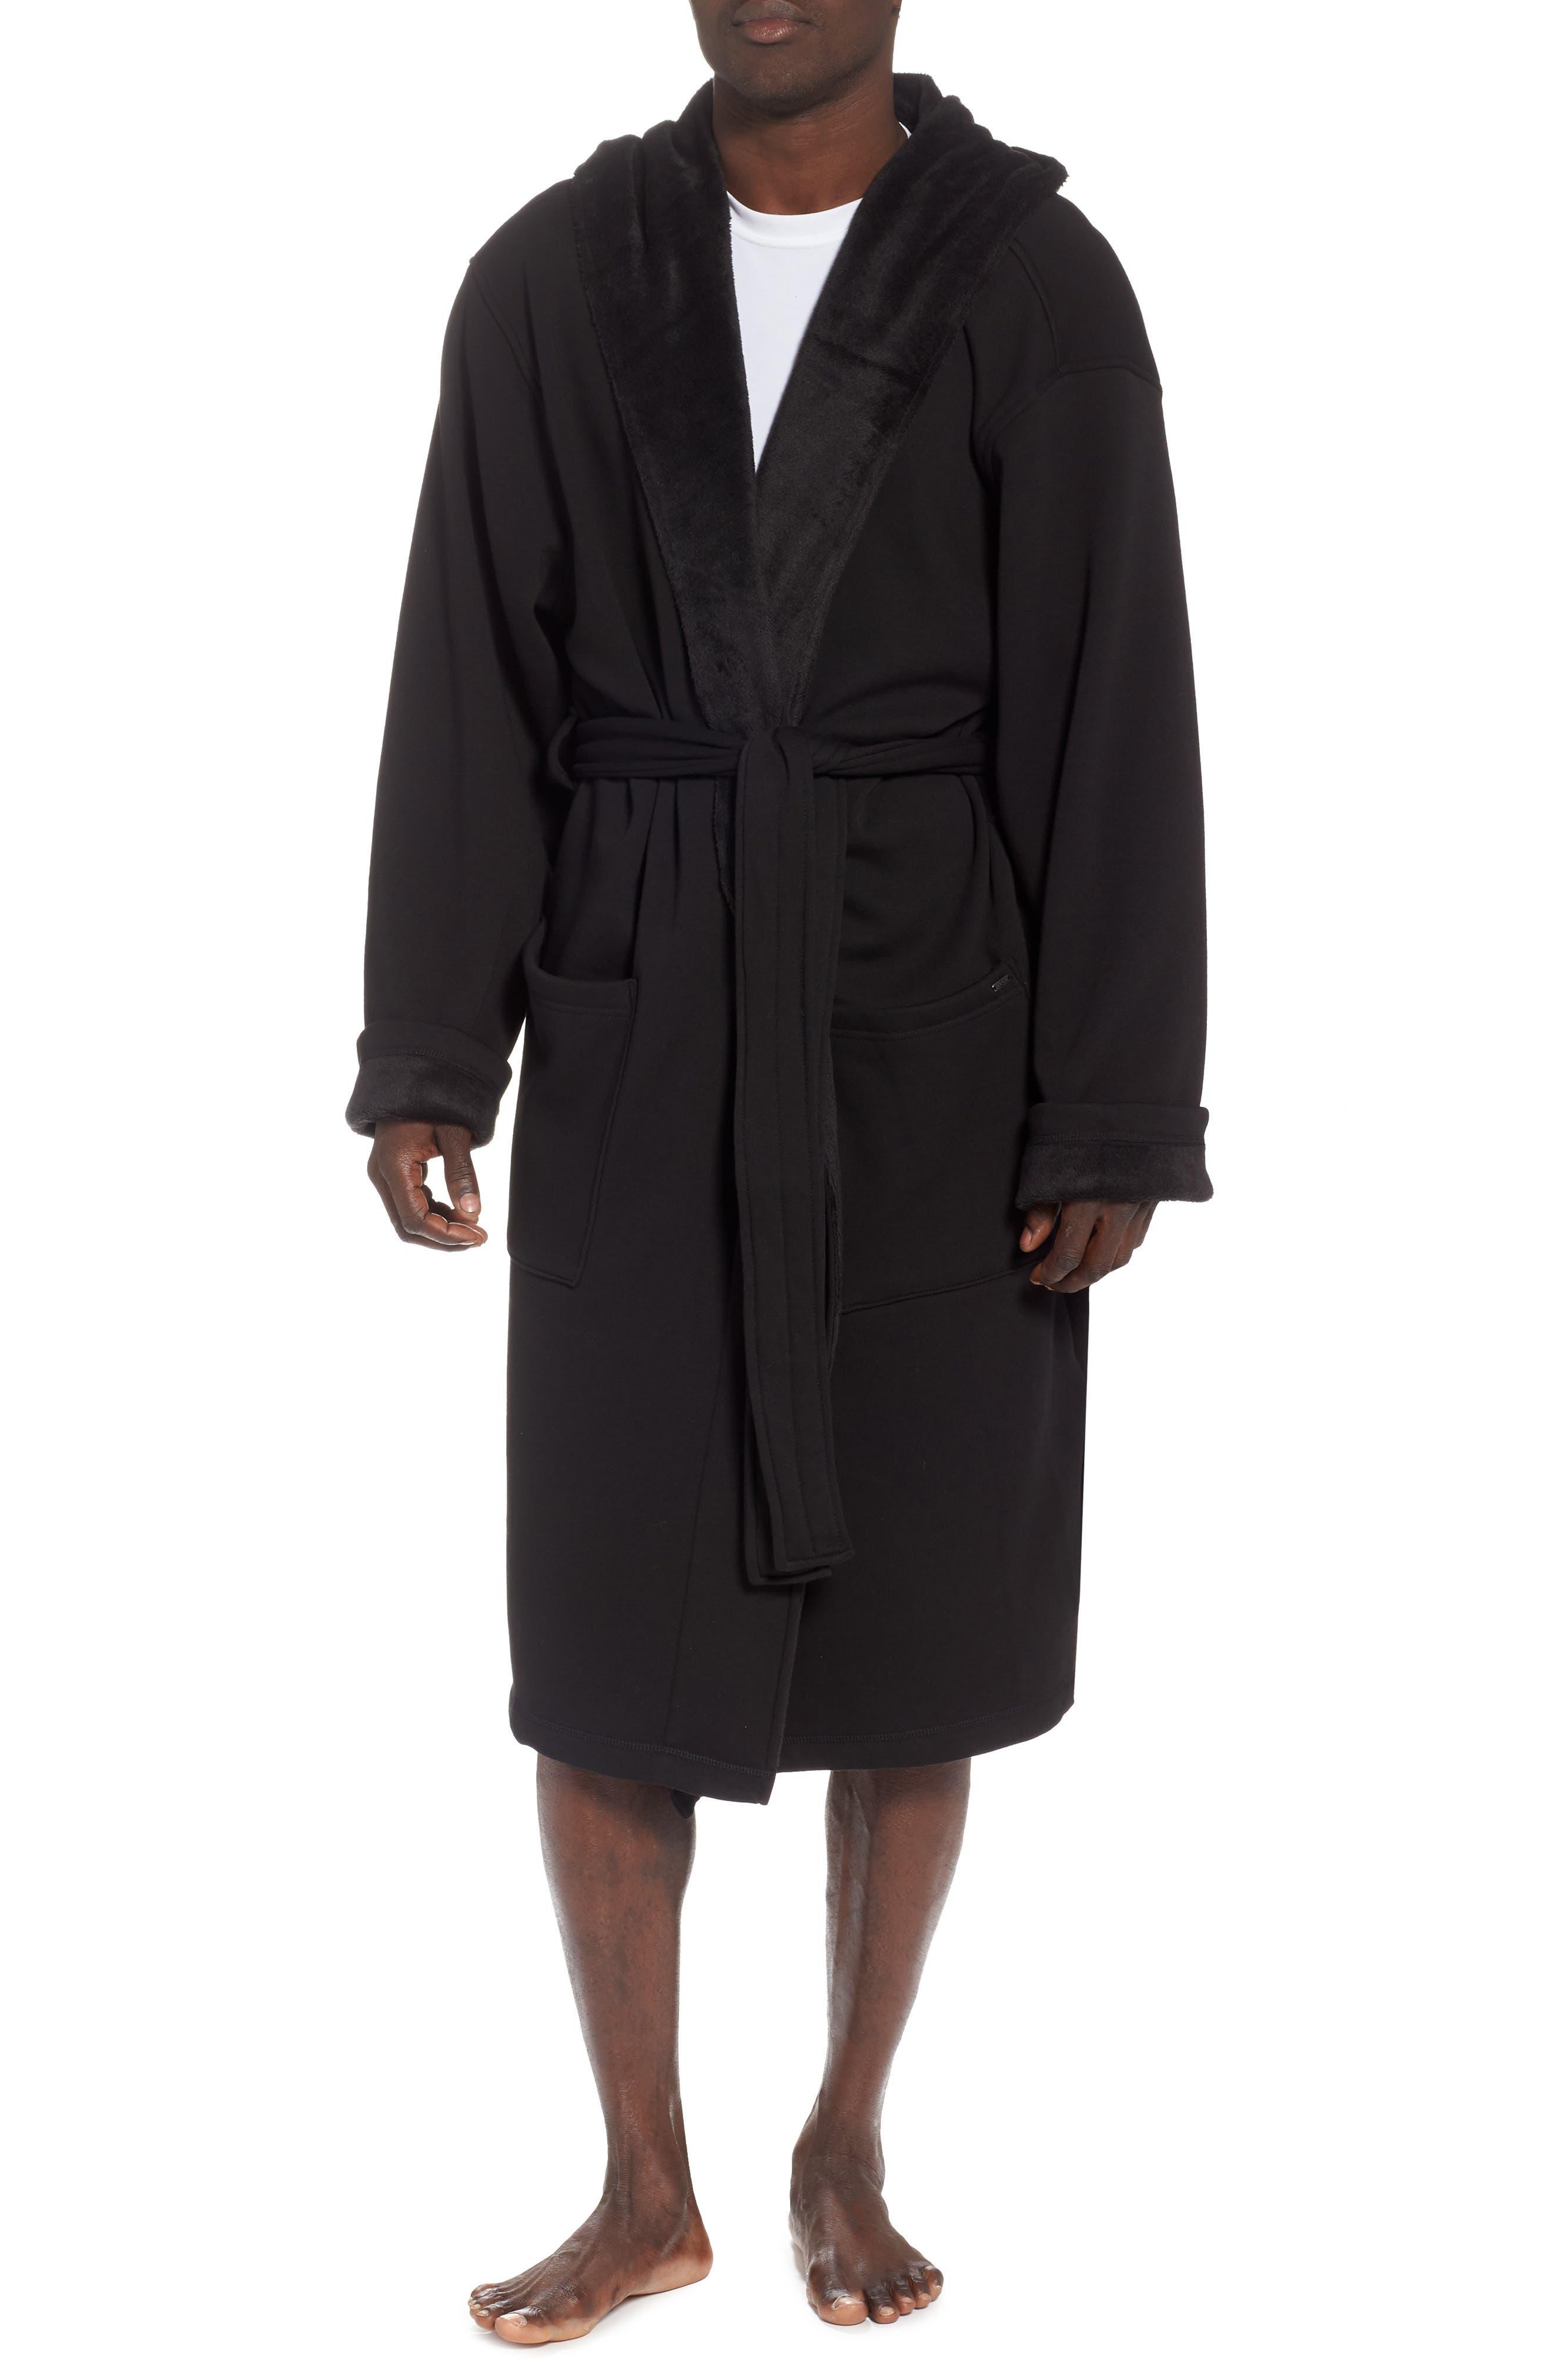 'Brunswick' Robe,                             Alternate thumbnail 2, color,                             001